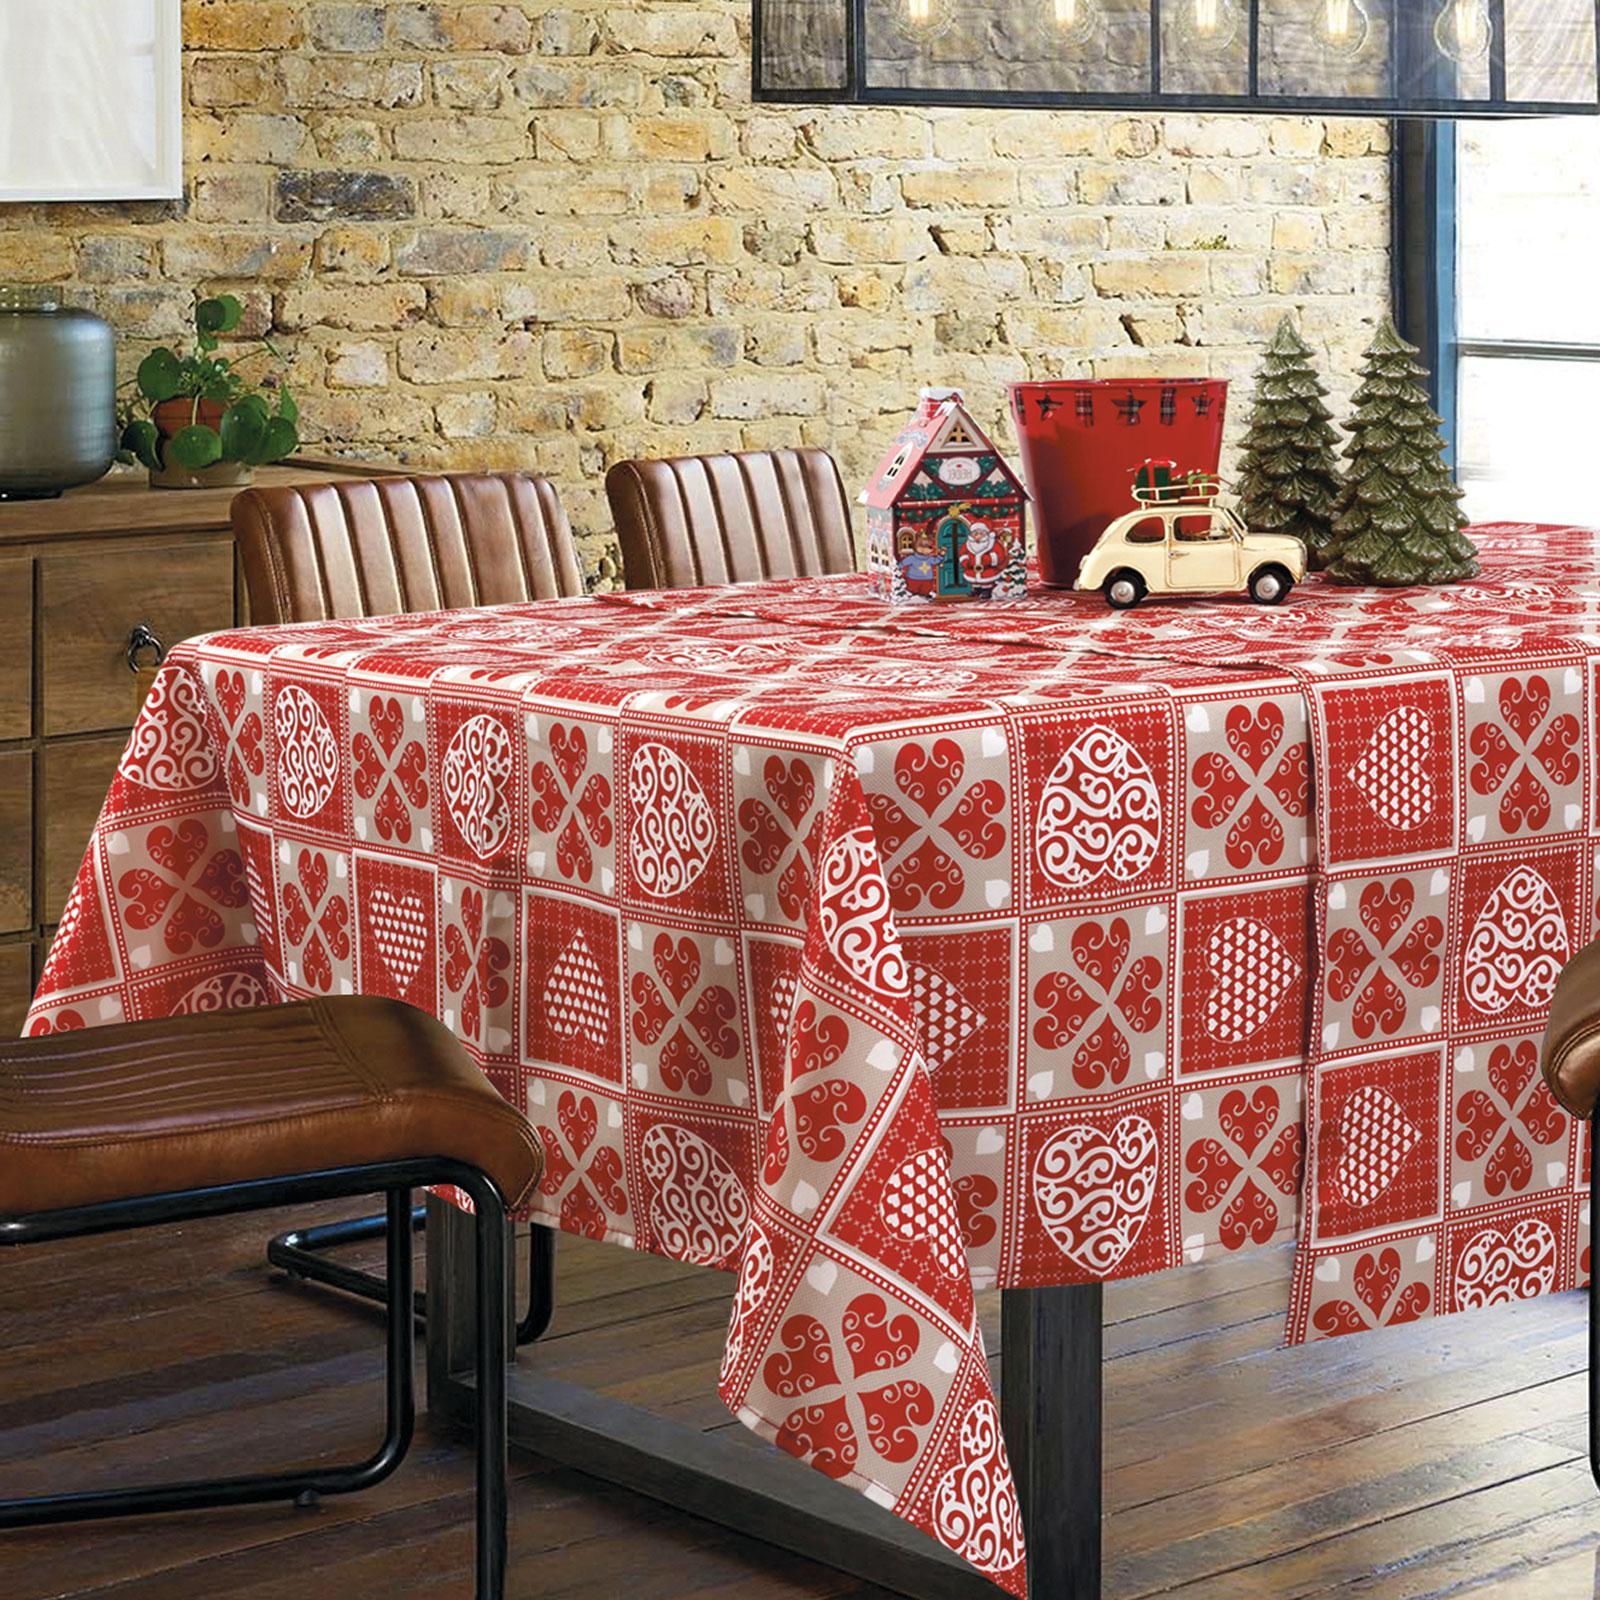 0572 Das Home Christmas Τραπεζομάντηλο 140x180 Μπεζ-Κόκκινο